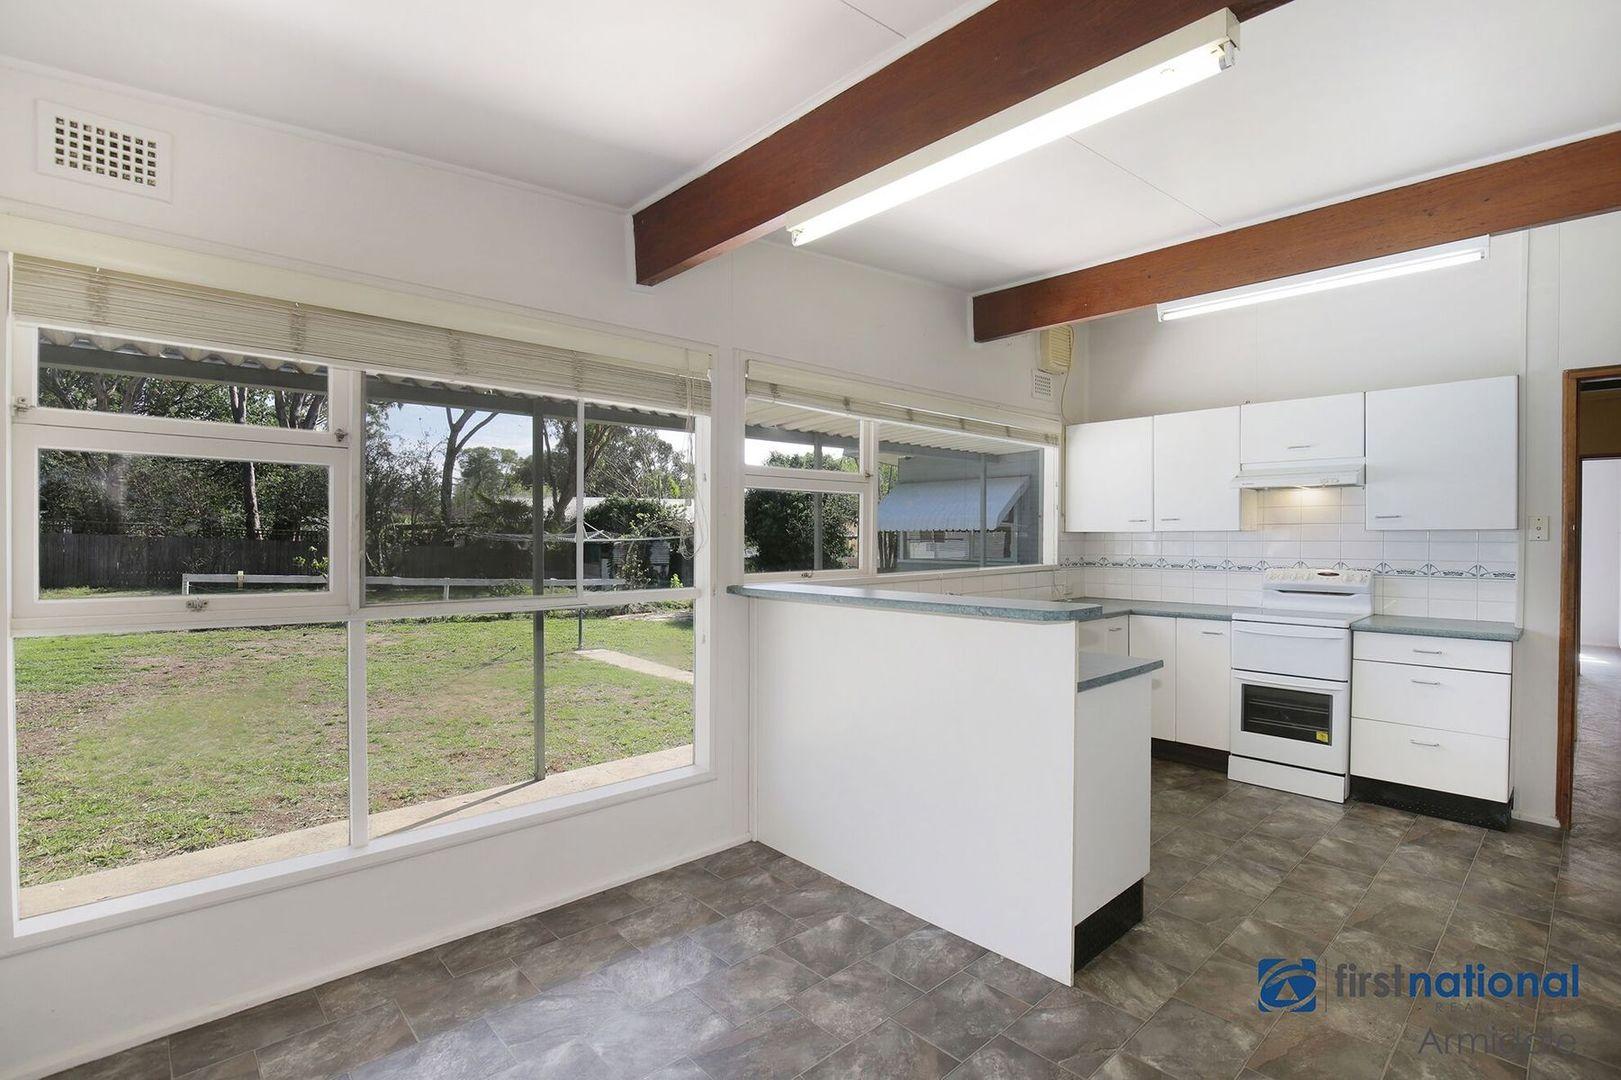 77 Erskine Street, Armidale NSW 2350, Image 2